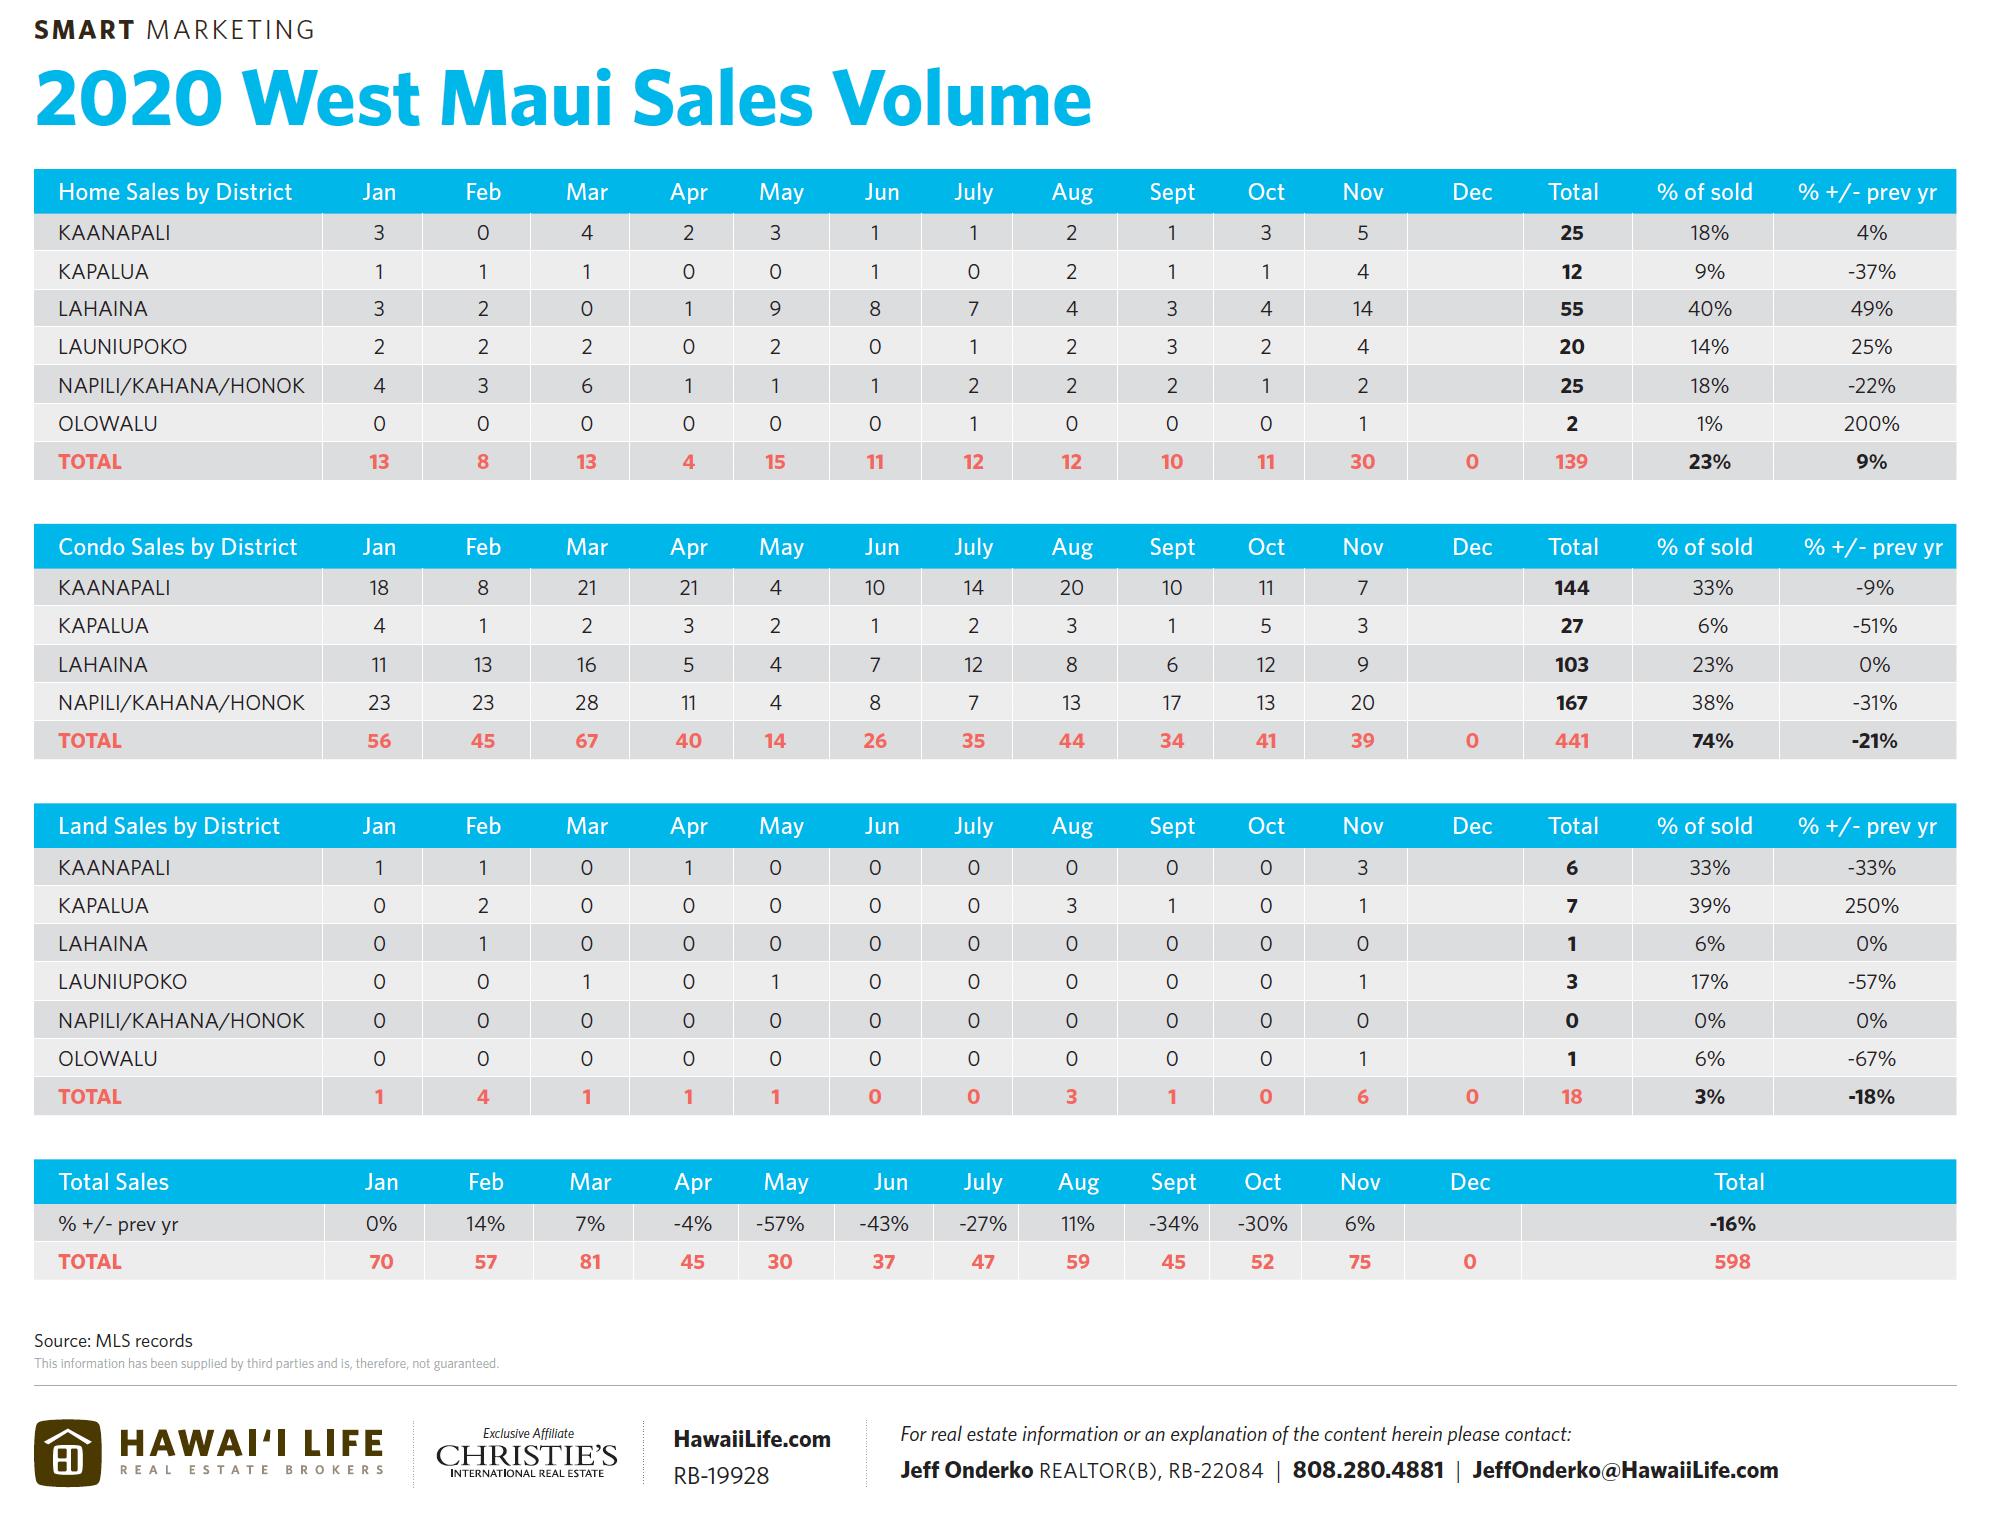 2020 west maui sales volume